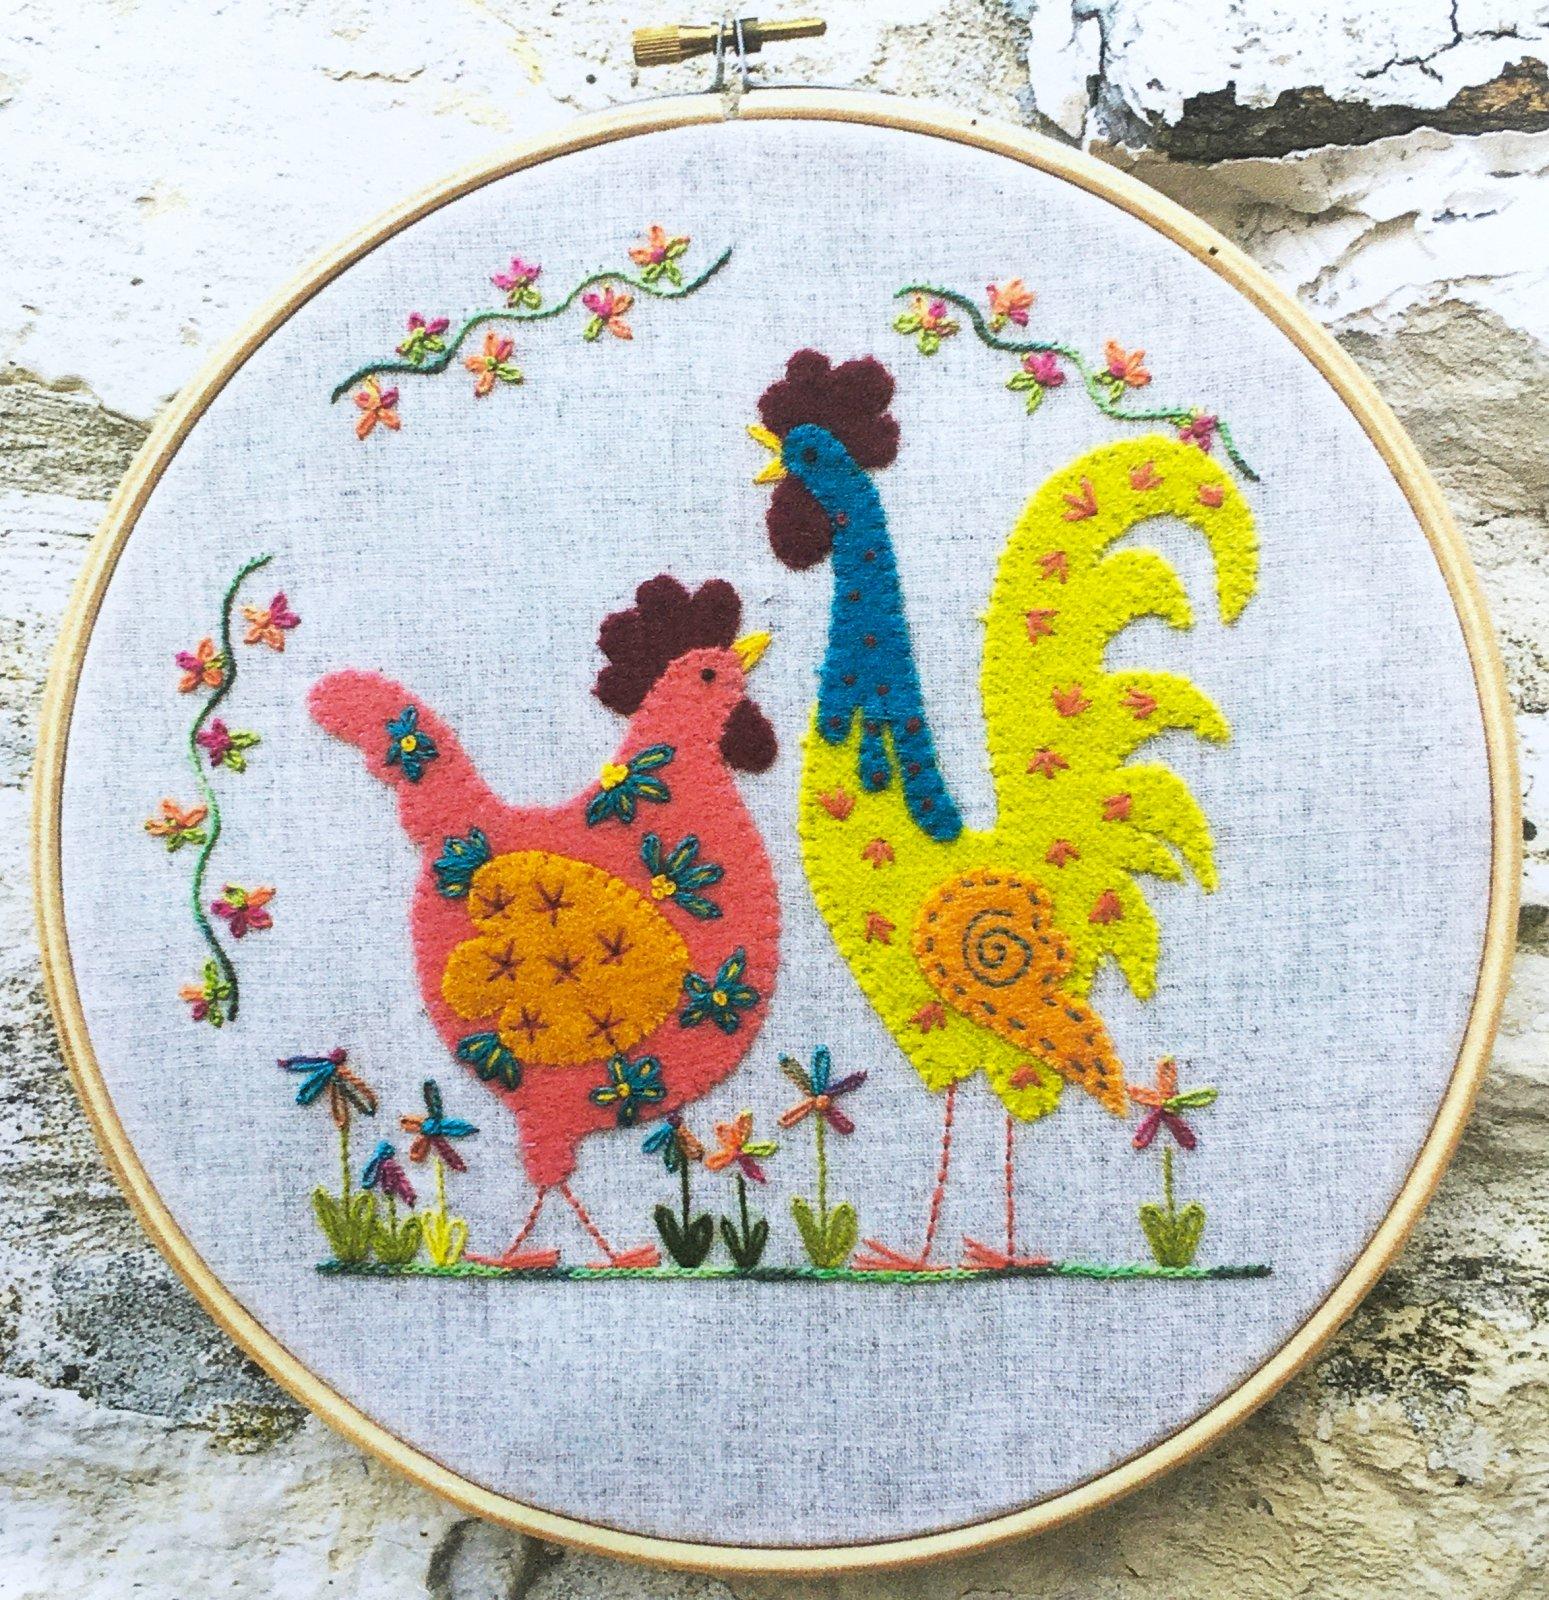 Chickens (L'Atelier D'Isabelle)